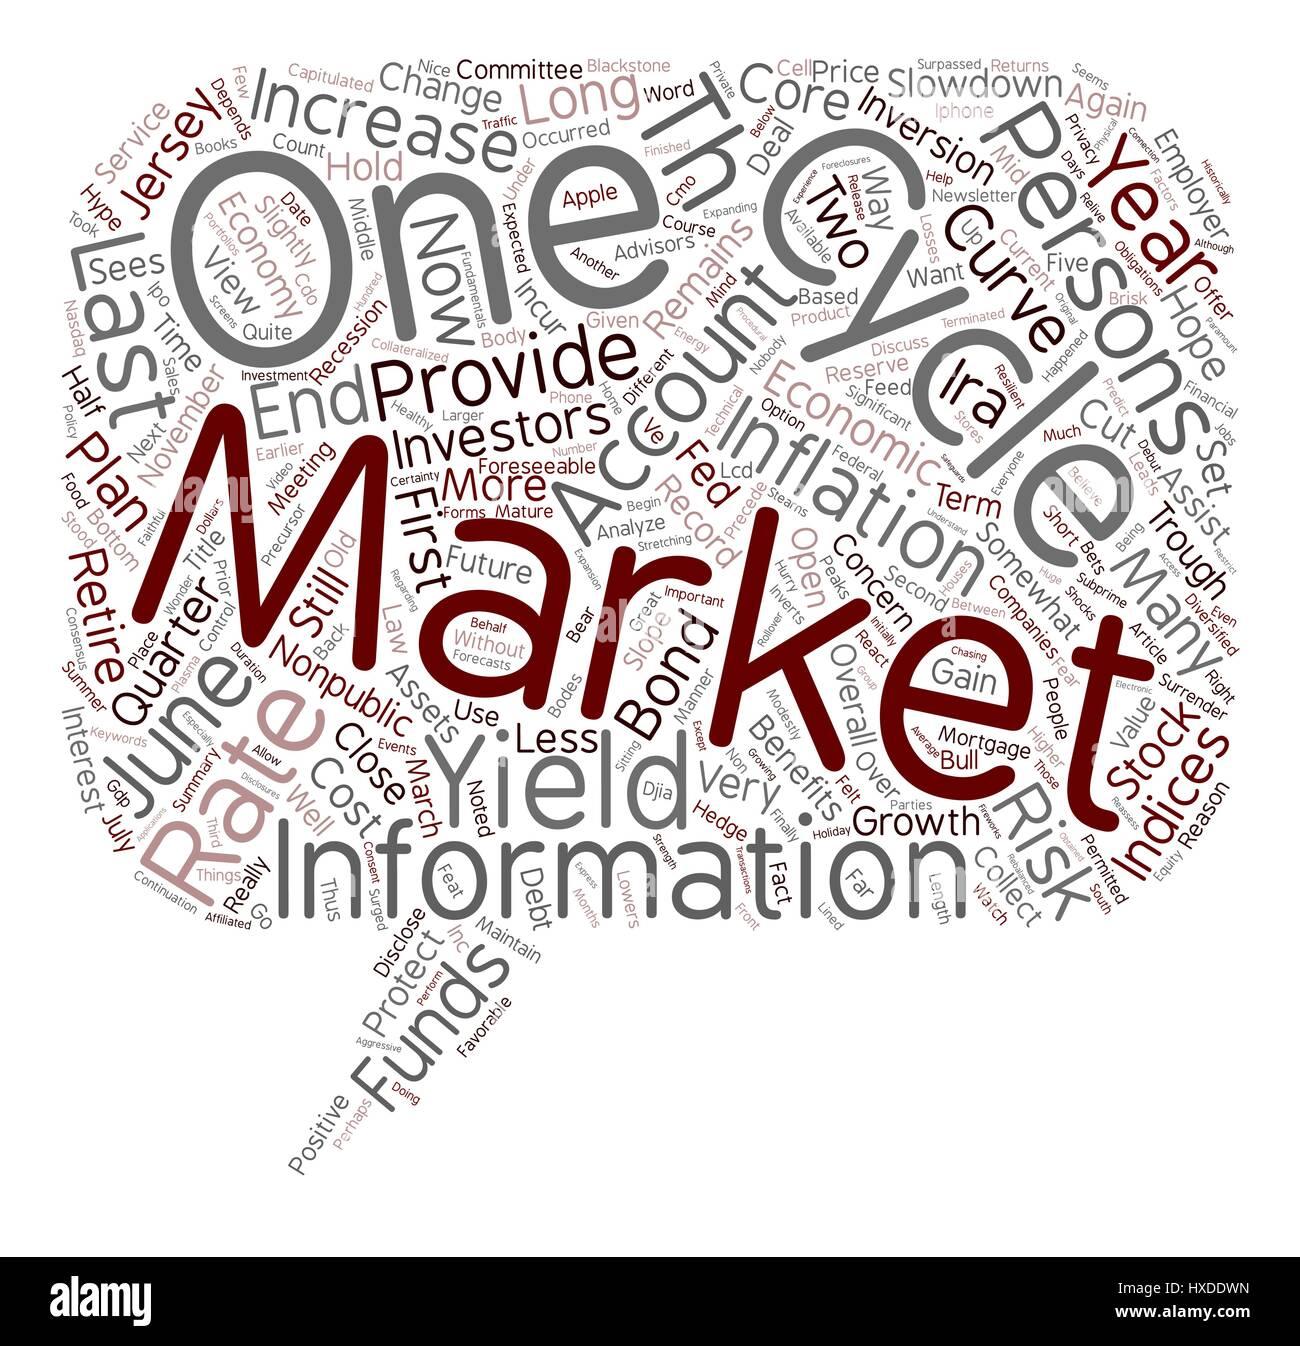 Jersey Benefits Advisors Newsletter Summer 2007 text background wordcloud concept - Stock Vector